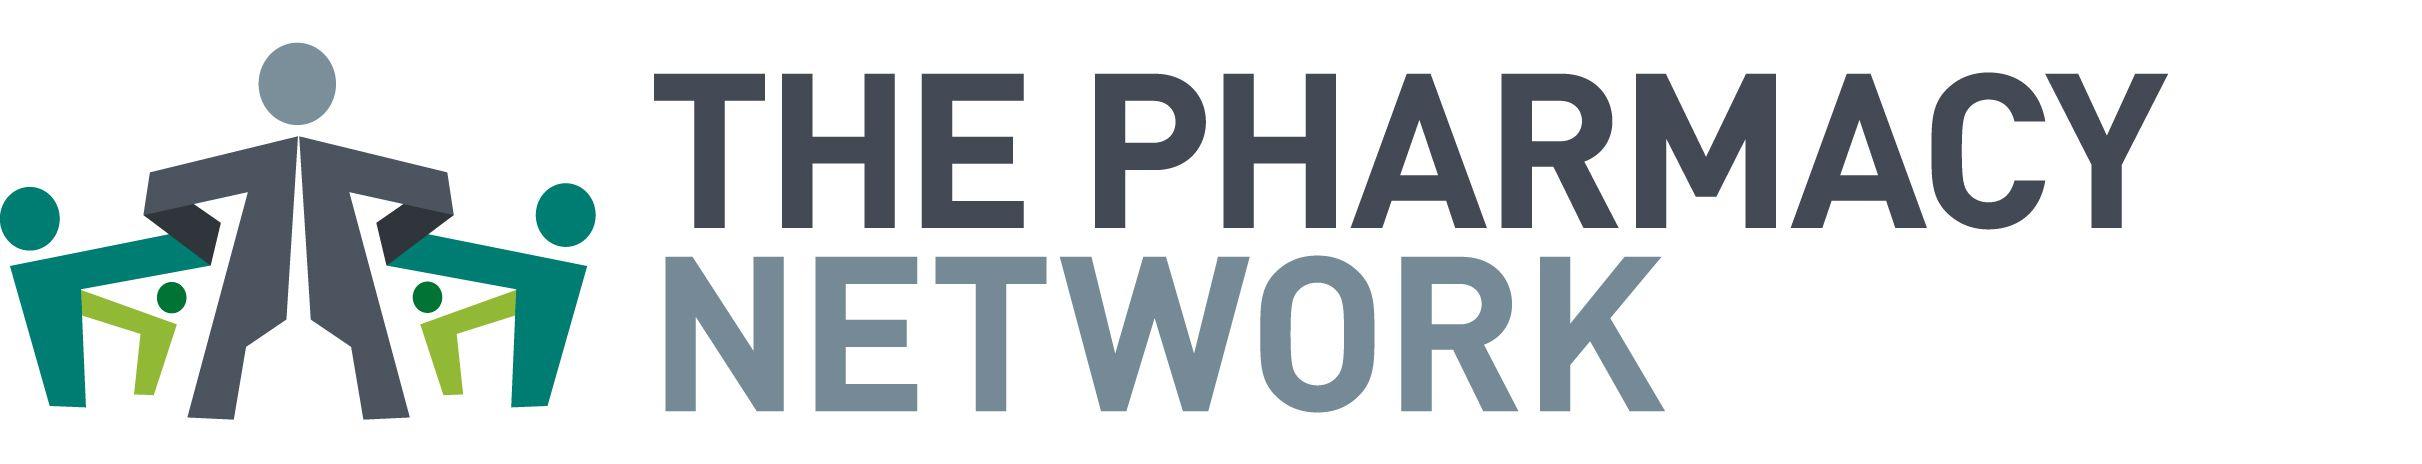 The Pharmacy Network